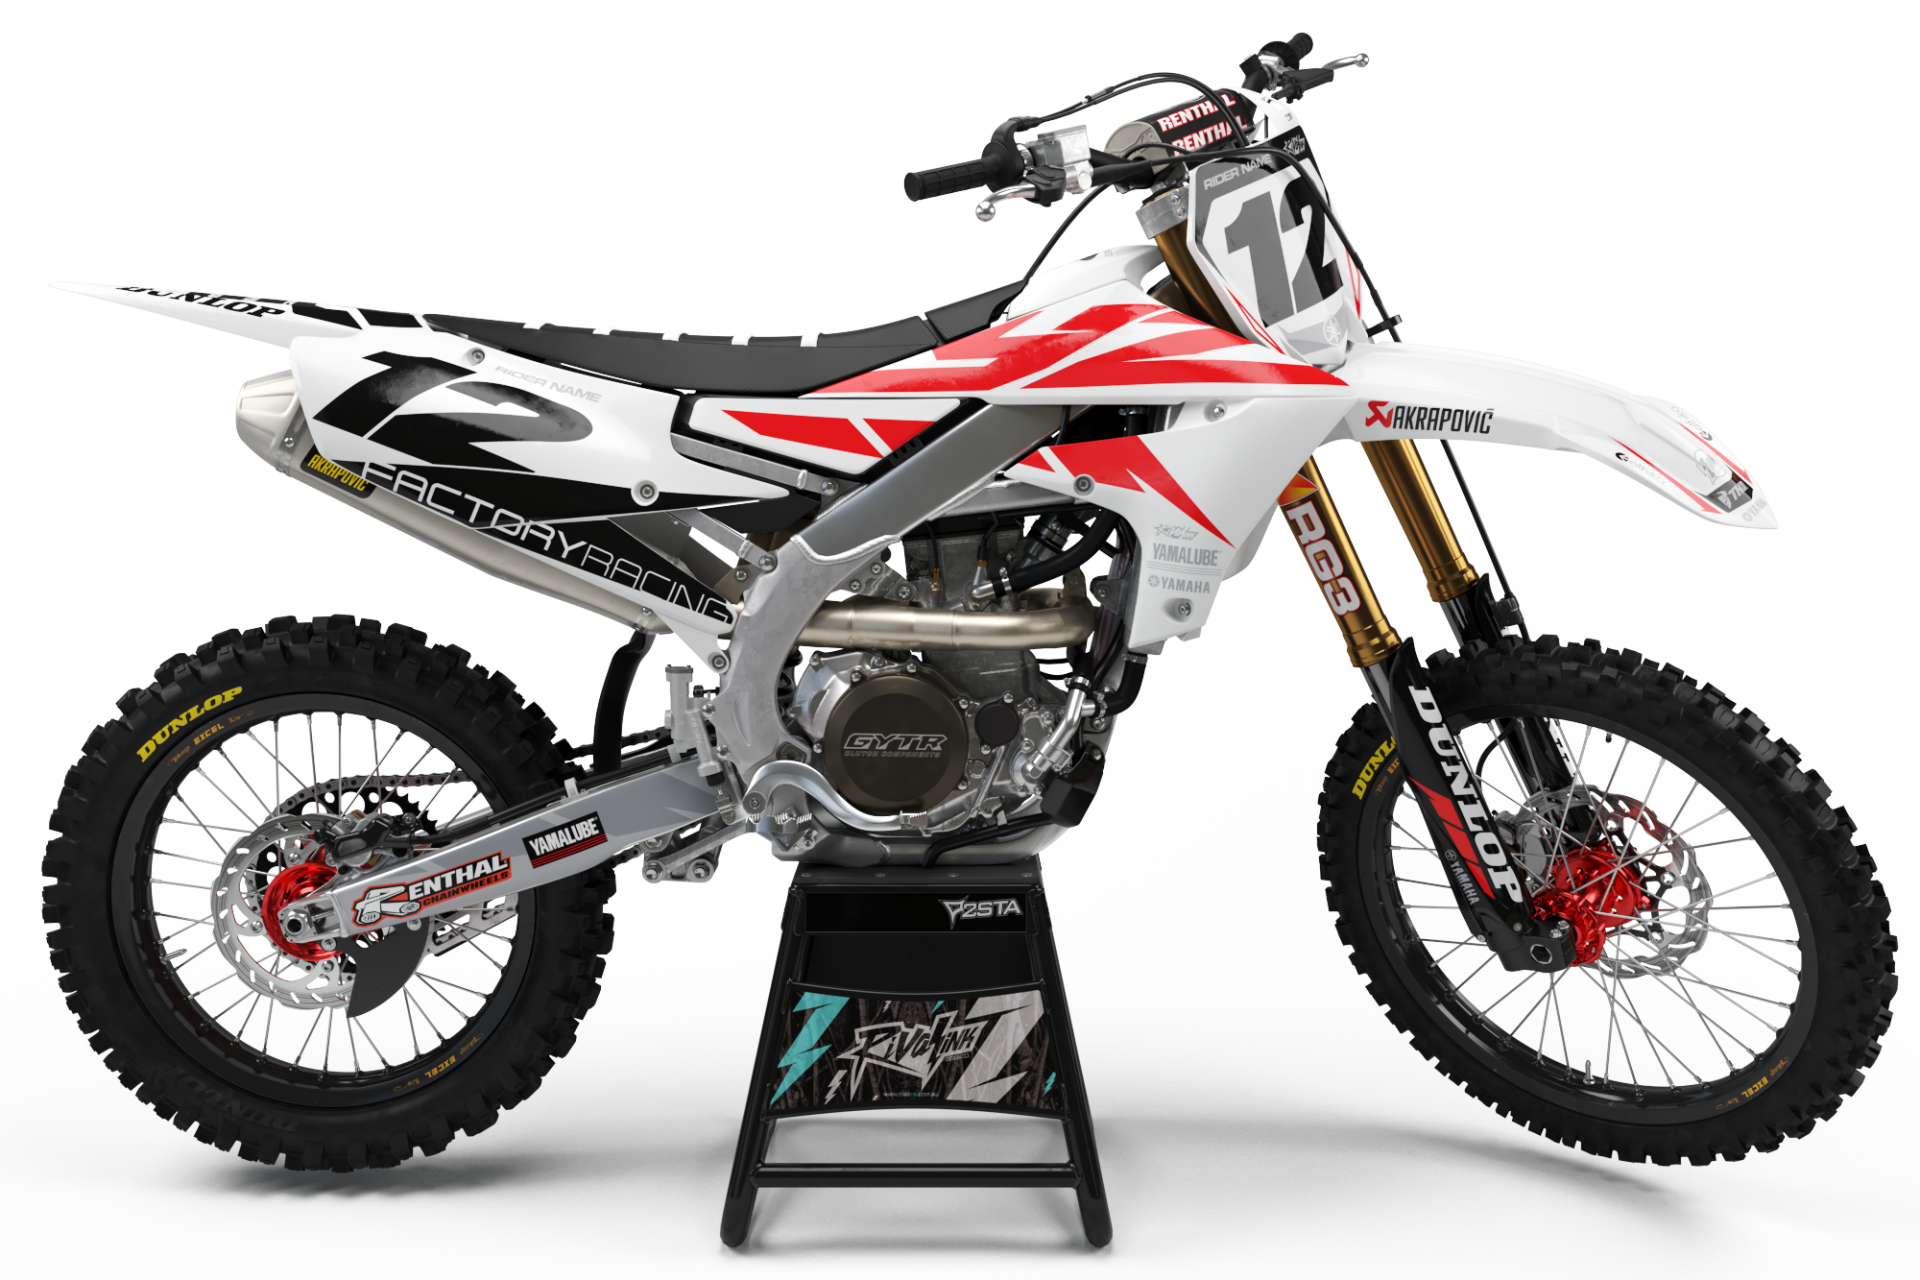 Idea By Jason Van Heerden On Bike Bike Yamaha Motorcycle